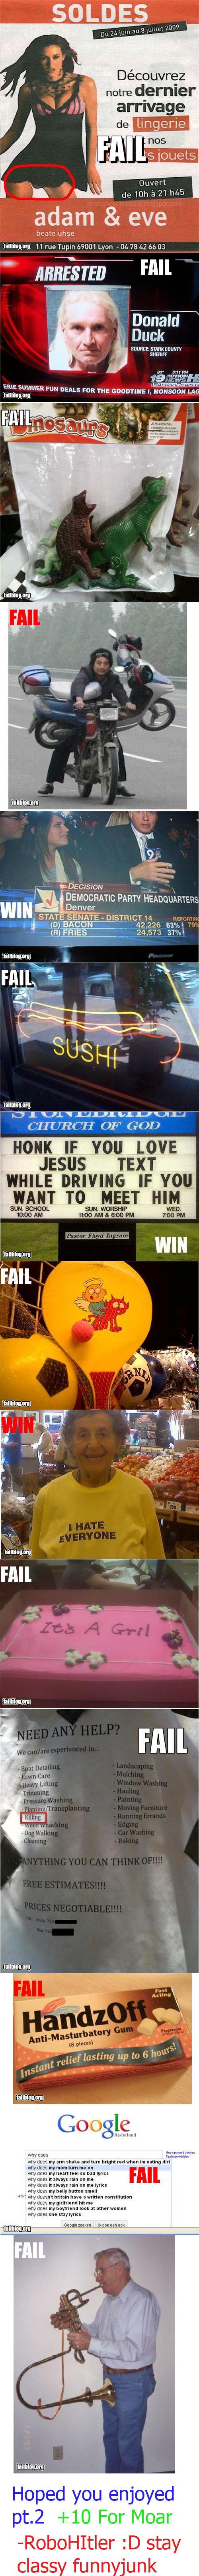 "Fail Comp. Pt. 2. fail comp pt 2<br /> pt1 www.funnyjunk.com/funny_pictures/589565/Fail+Comp+Pt+1/. u M gum in 819"" notre dealer adam & eve beats uhsa 11  fail blog comp funny"